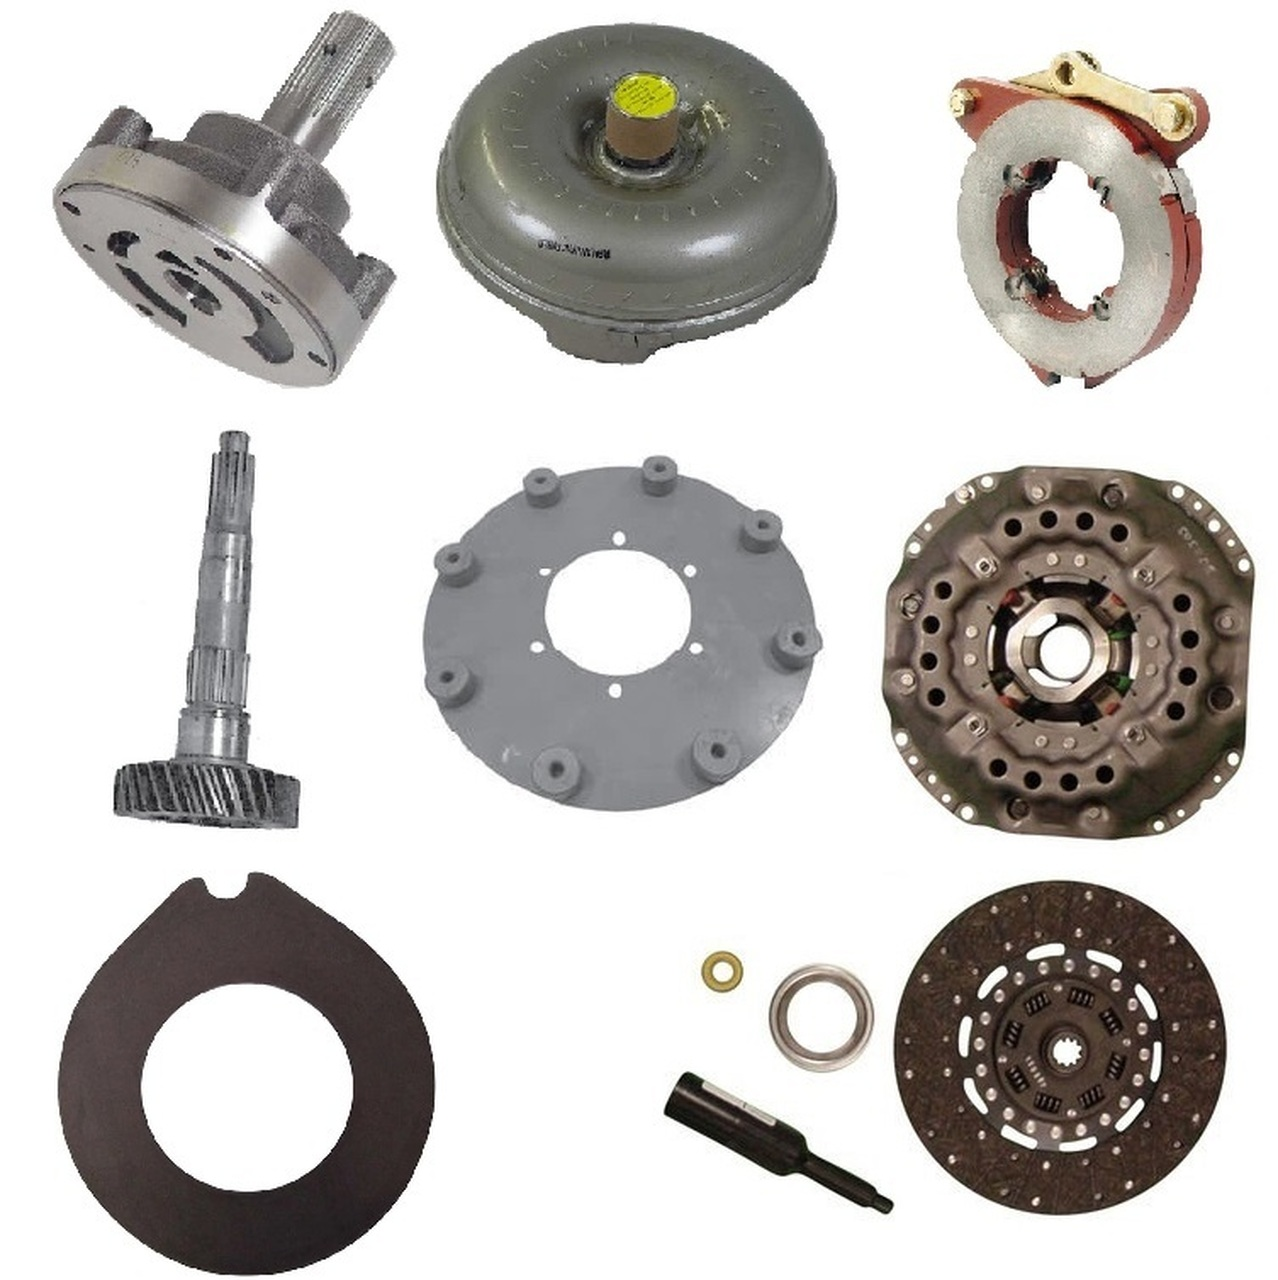 Transmission, Brakes, Clutch